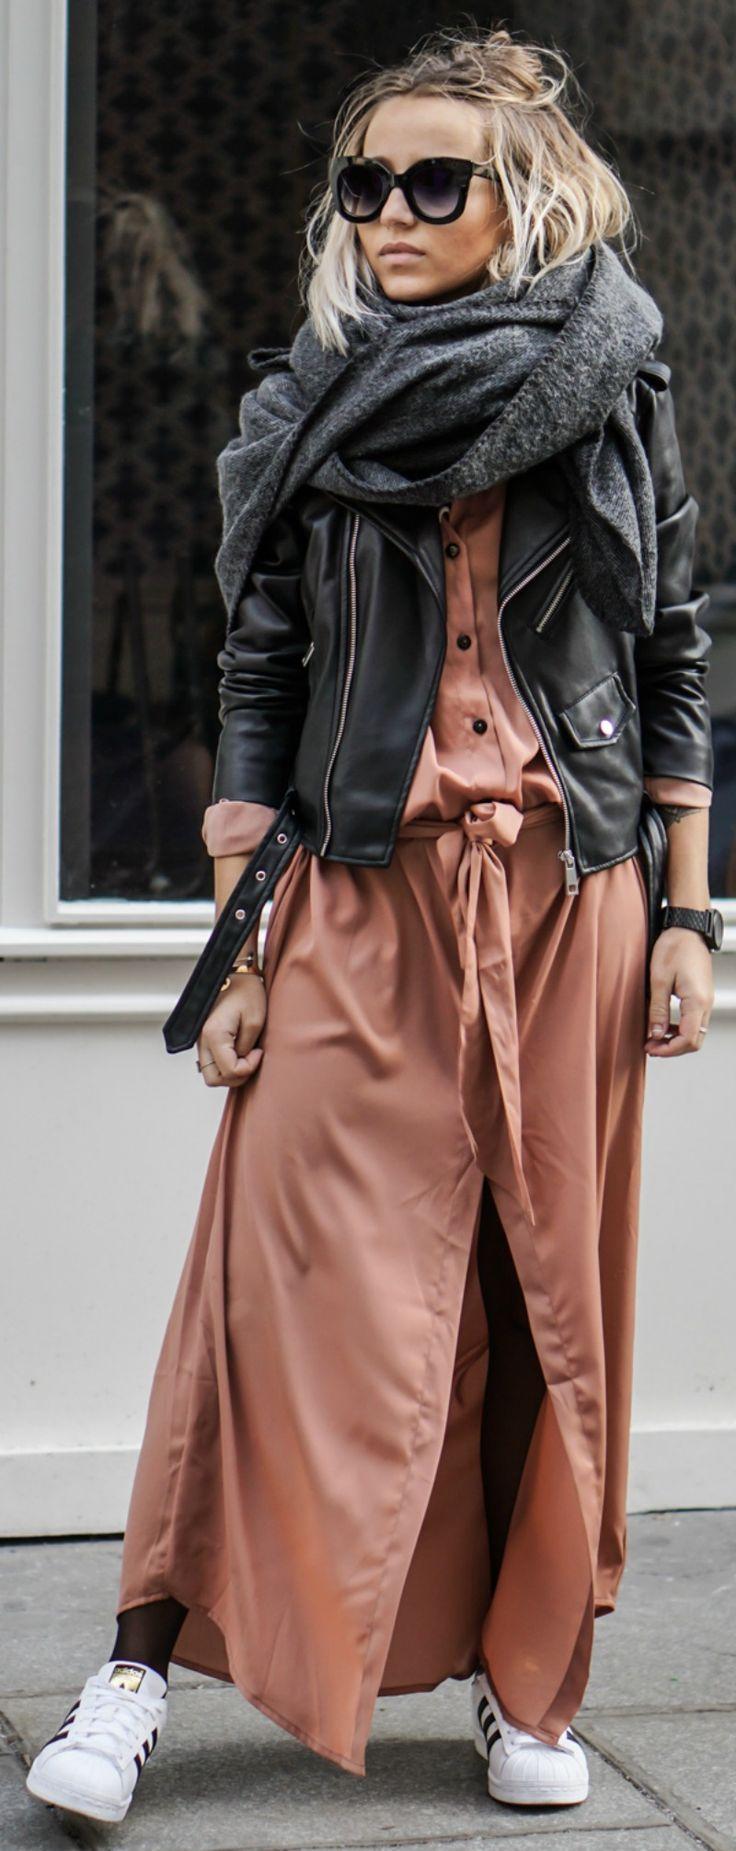 Shirt dress + Camille Callen + coral maxi style + oversized scarf + Adidas Superstars.   Shirt: Stylestalker, Scarf: Asos, Jacket: Zara, Sneakers: Adidas.